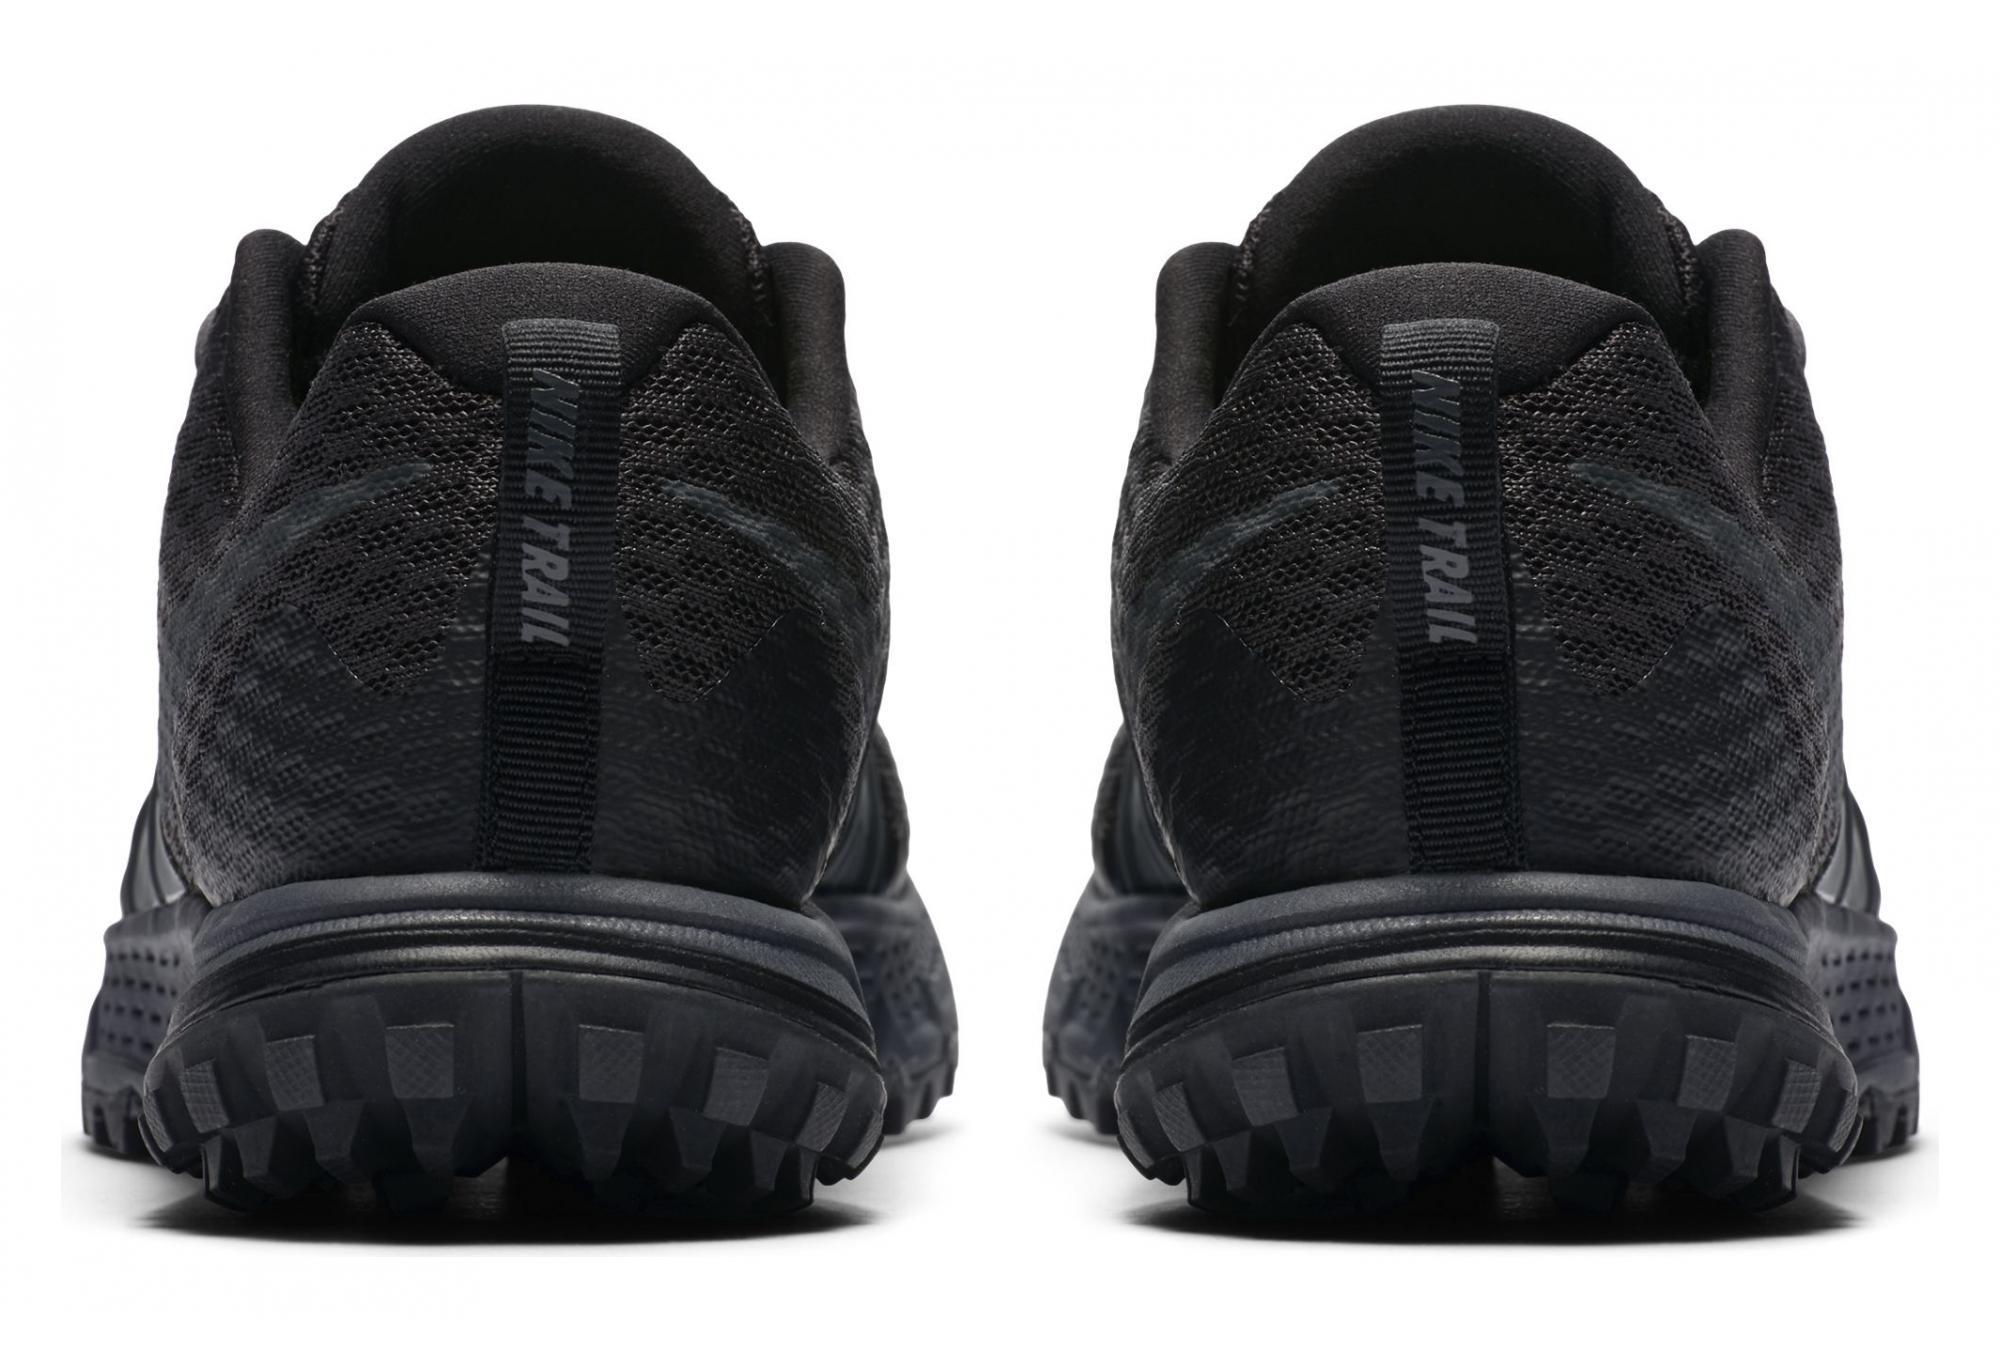 official photos on feet shots of 50% price Nike Air Zoom Wildhorse 4 Black Grey Women | Alltricks.com